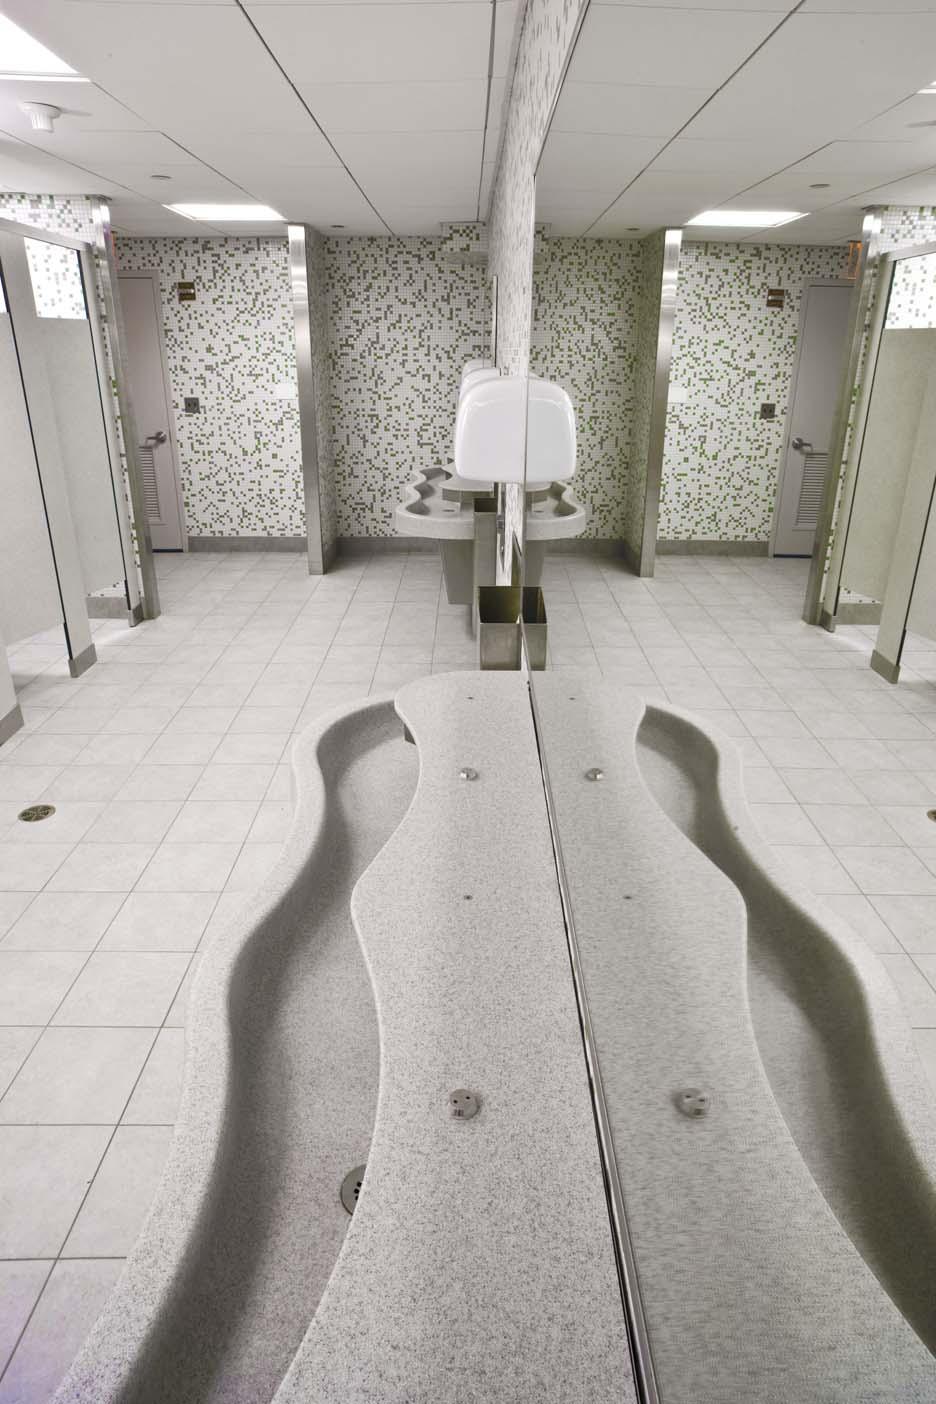 DesignLaboratories-Cafe & Bathrooms 0494.jpg